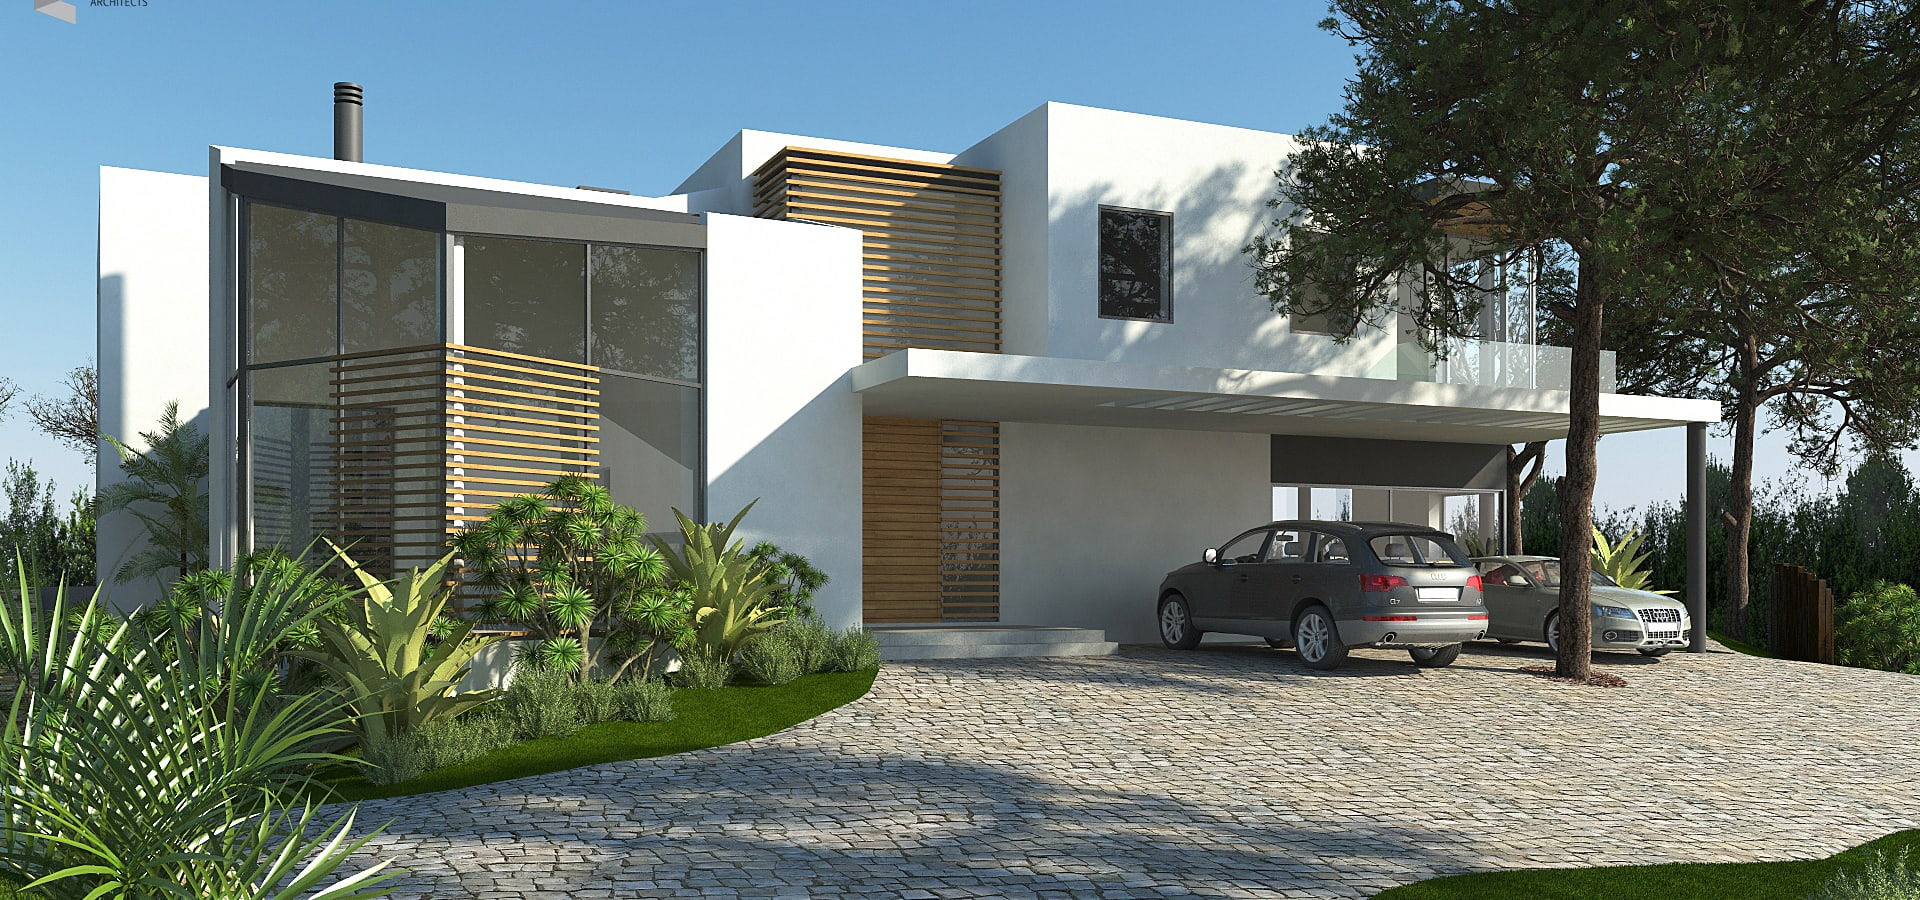 Essencia Architects